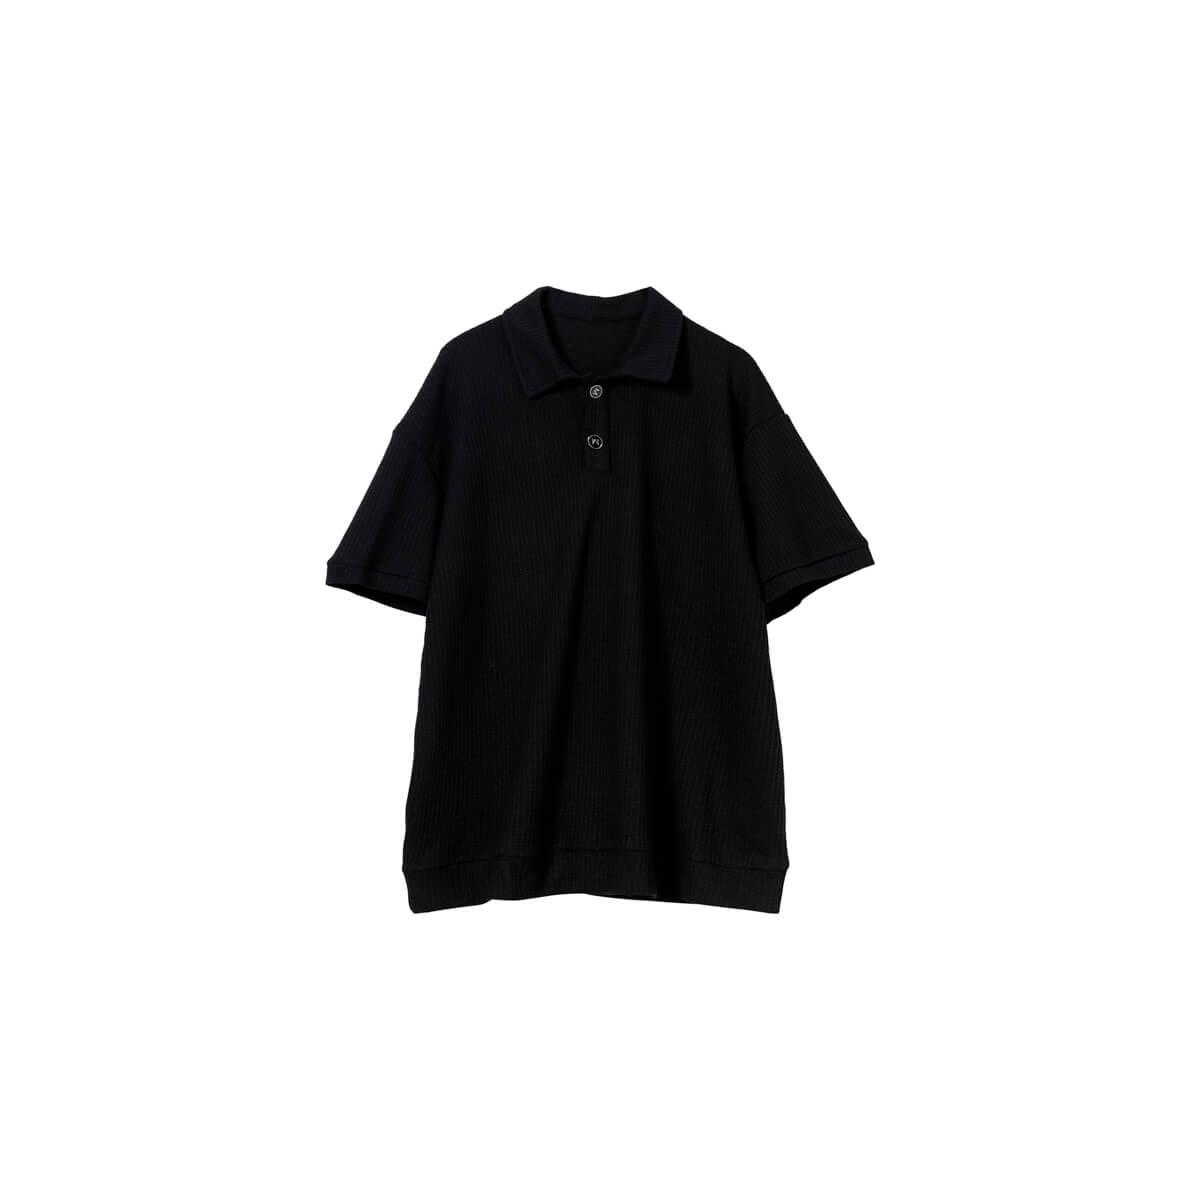 Футболка Cui Layout Studio Polo T-shirt Waffle Texture Black